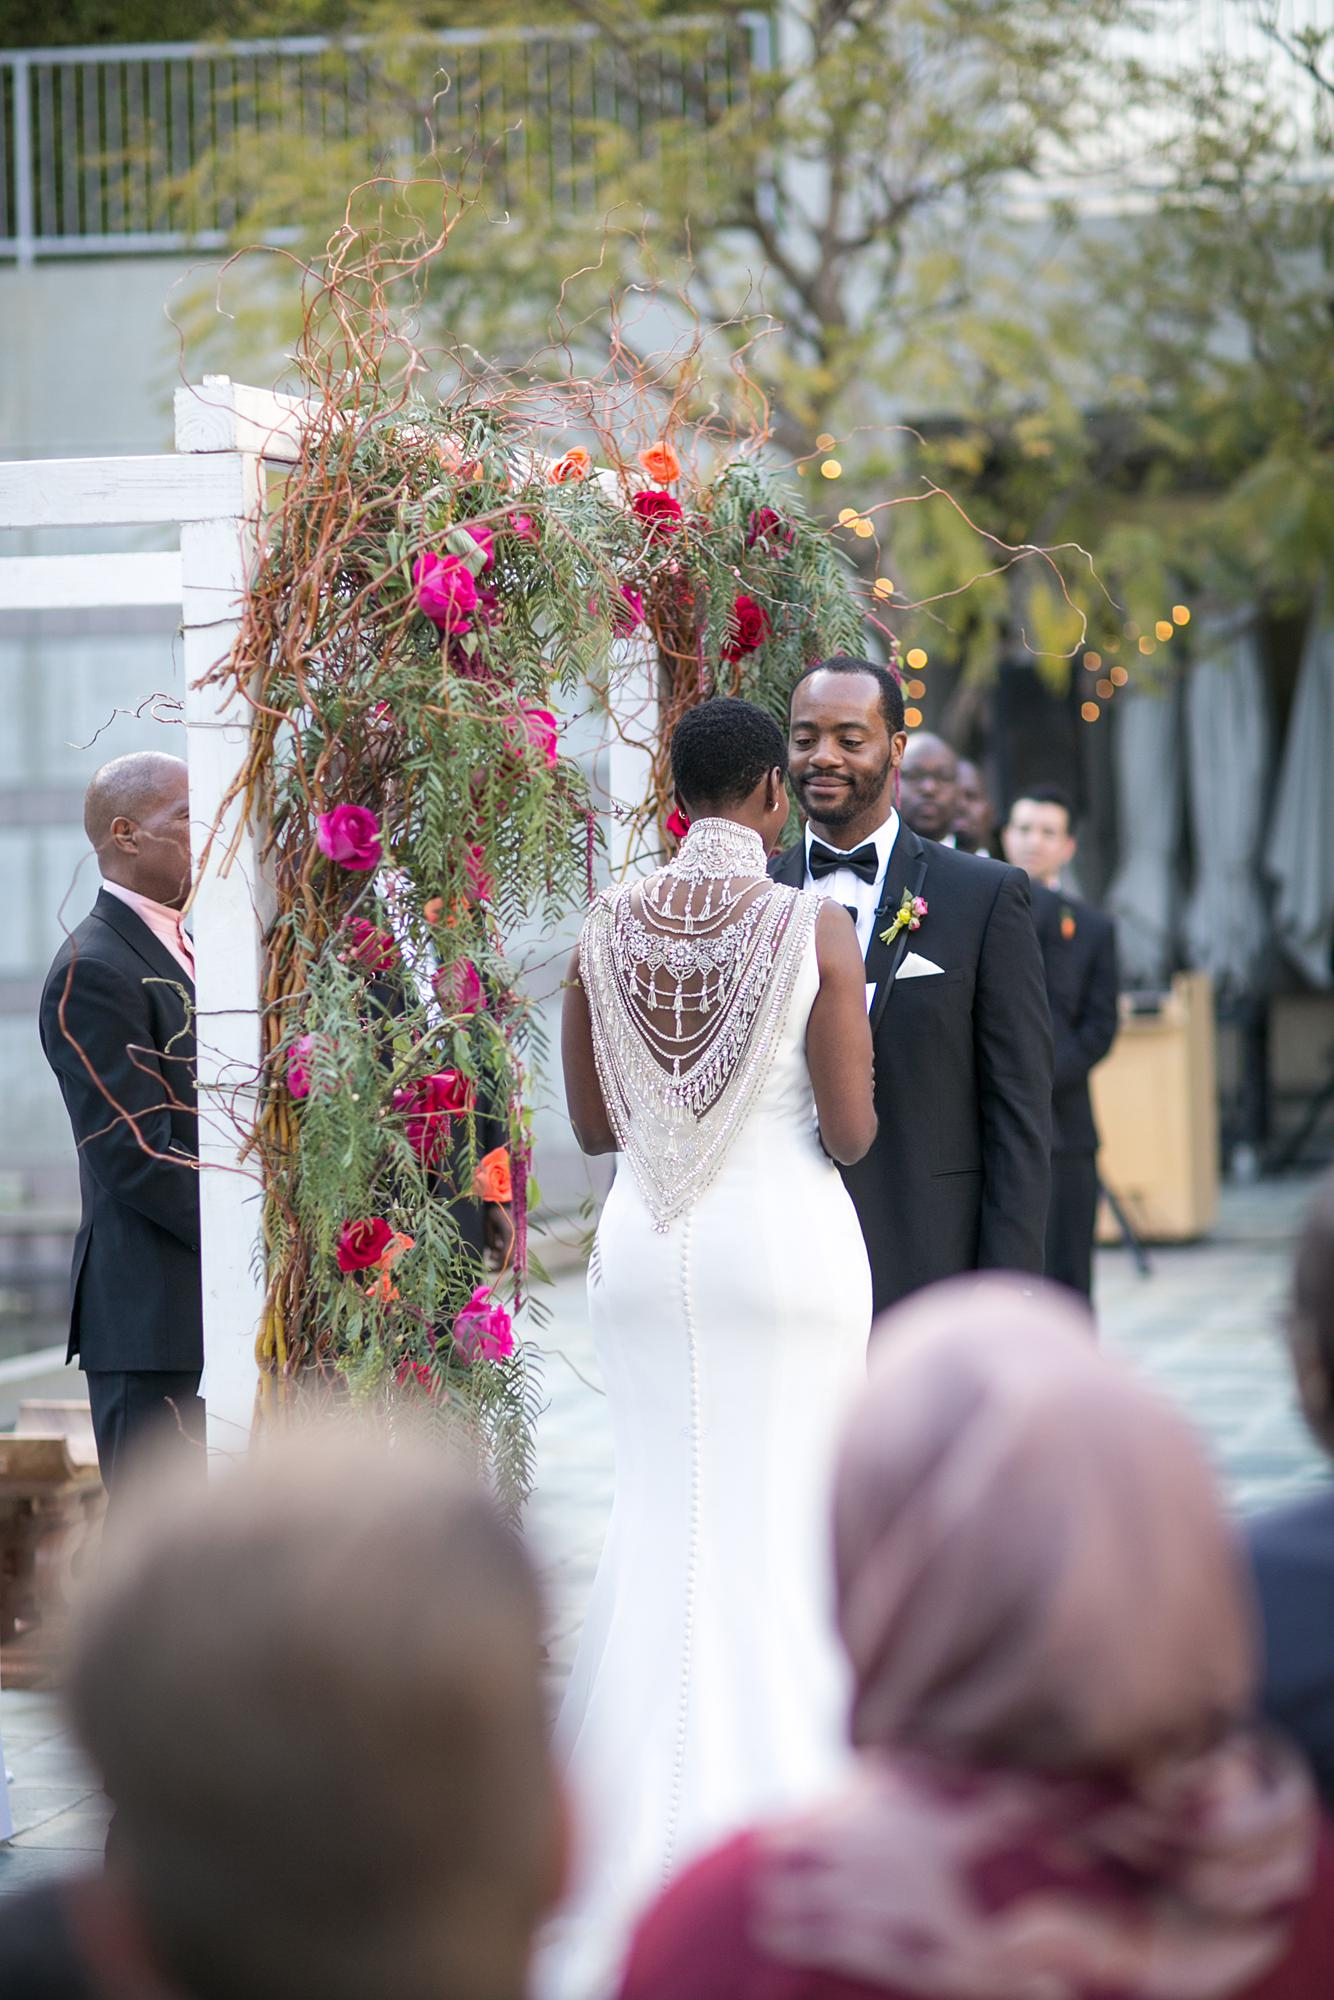 skirball-cultural-center-wedding-DC-25.jpg